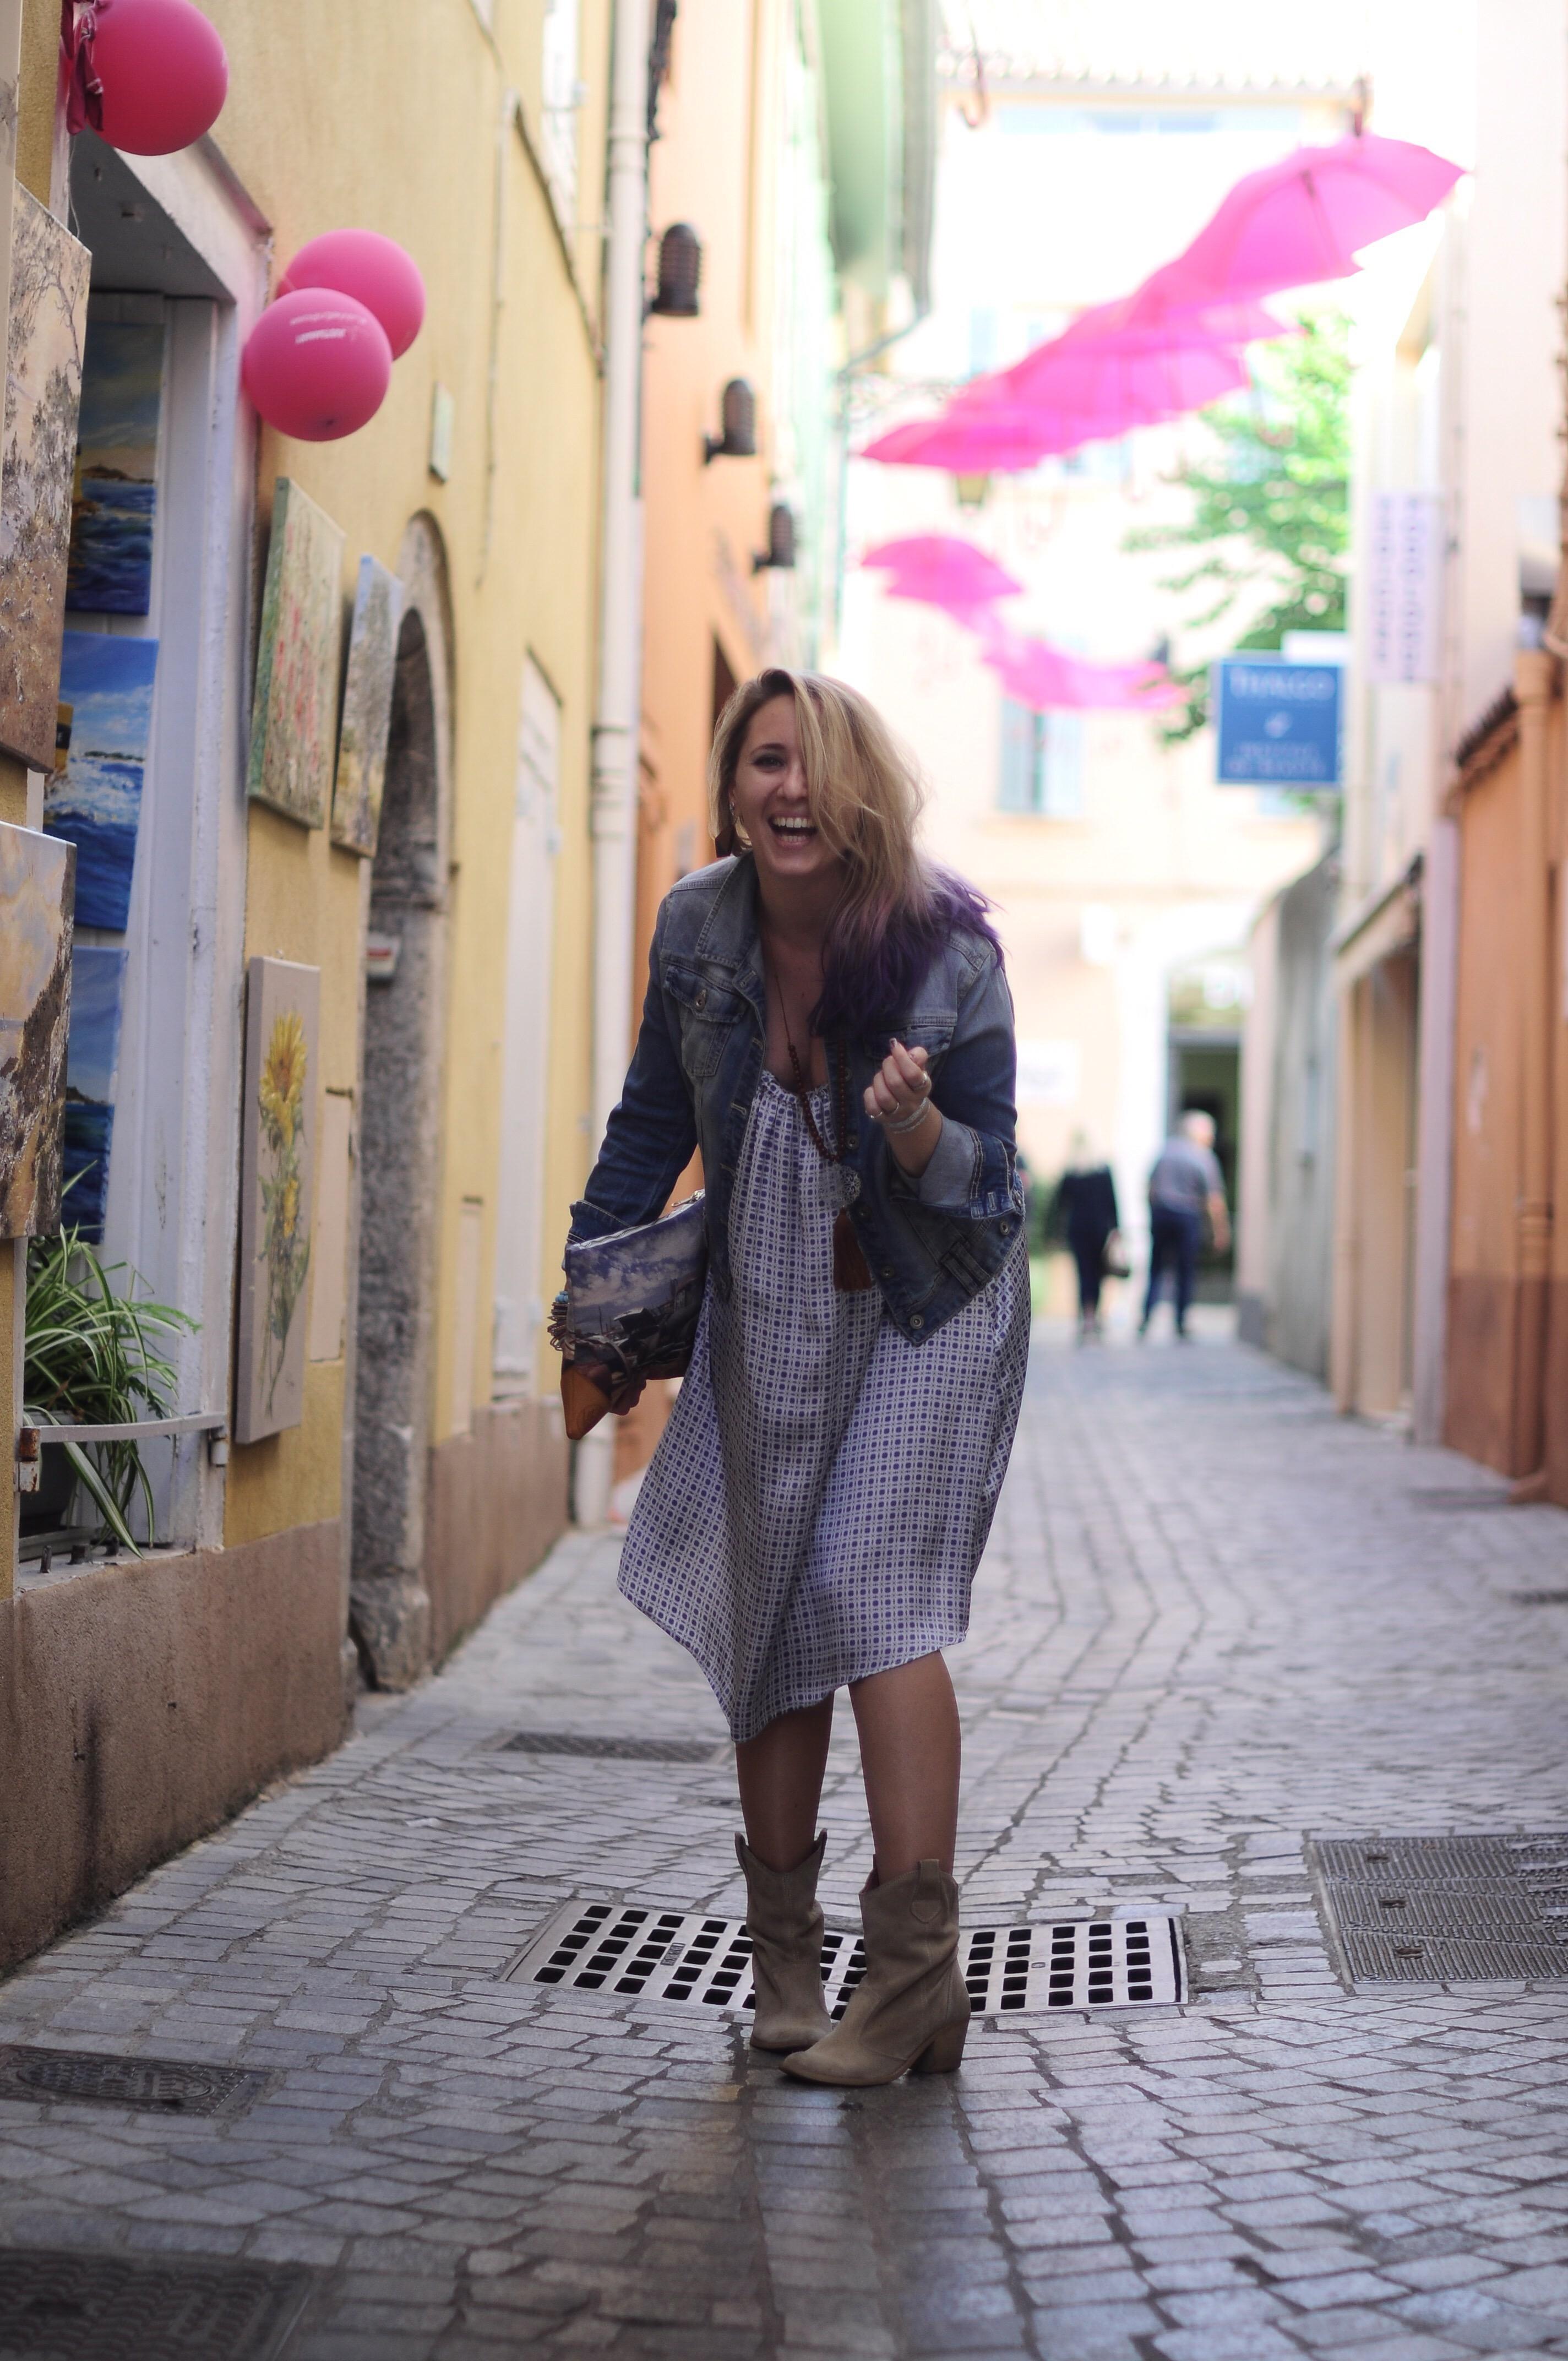 robe Salsa, nomad, primark, ootd, look, style, rêeuse, ethnikk, balabooste